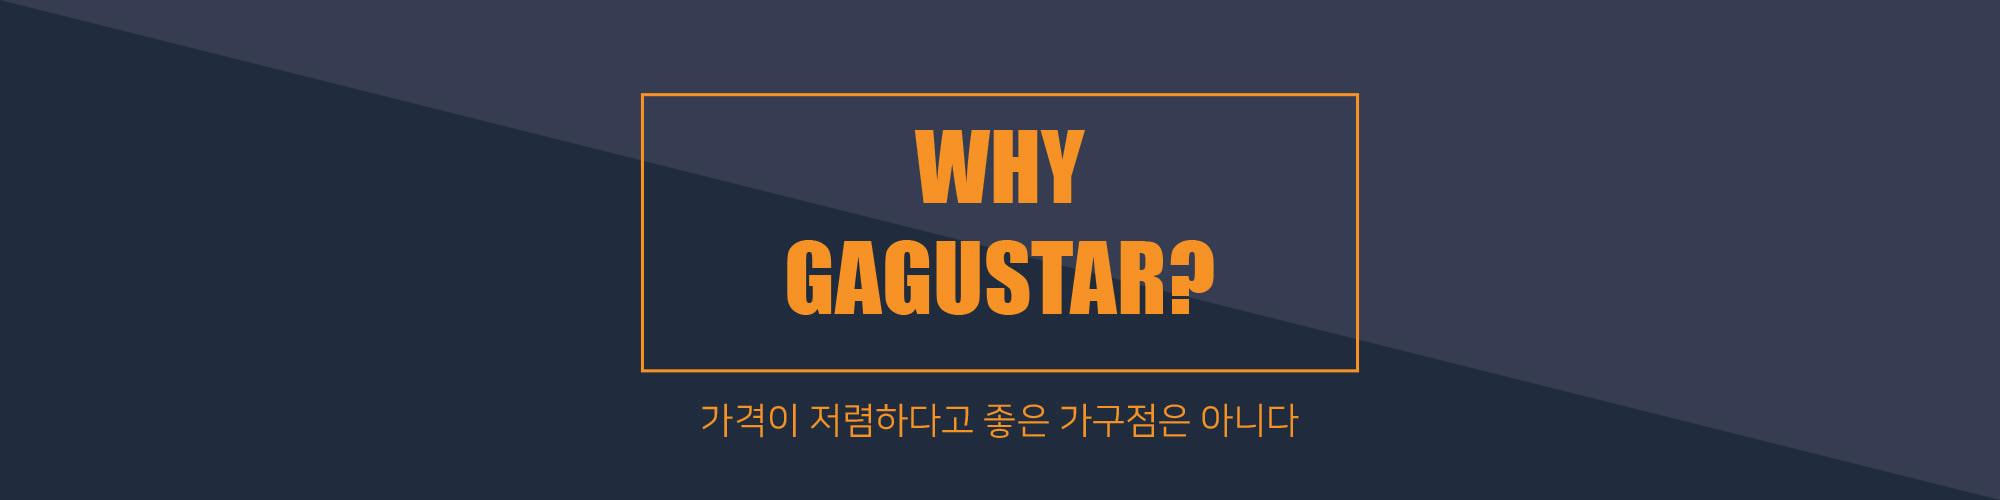 why gagustar